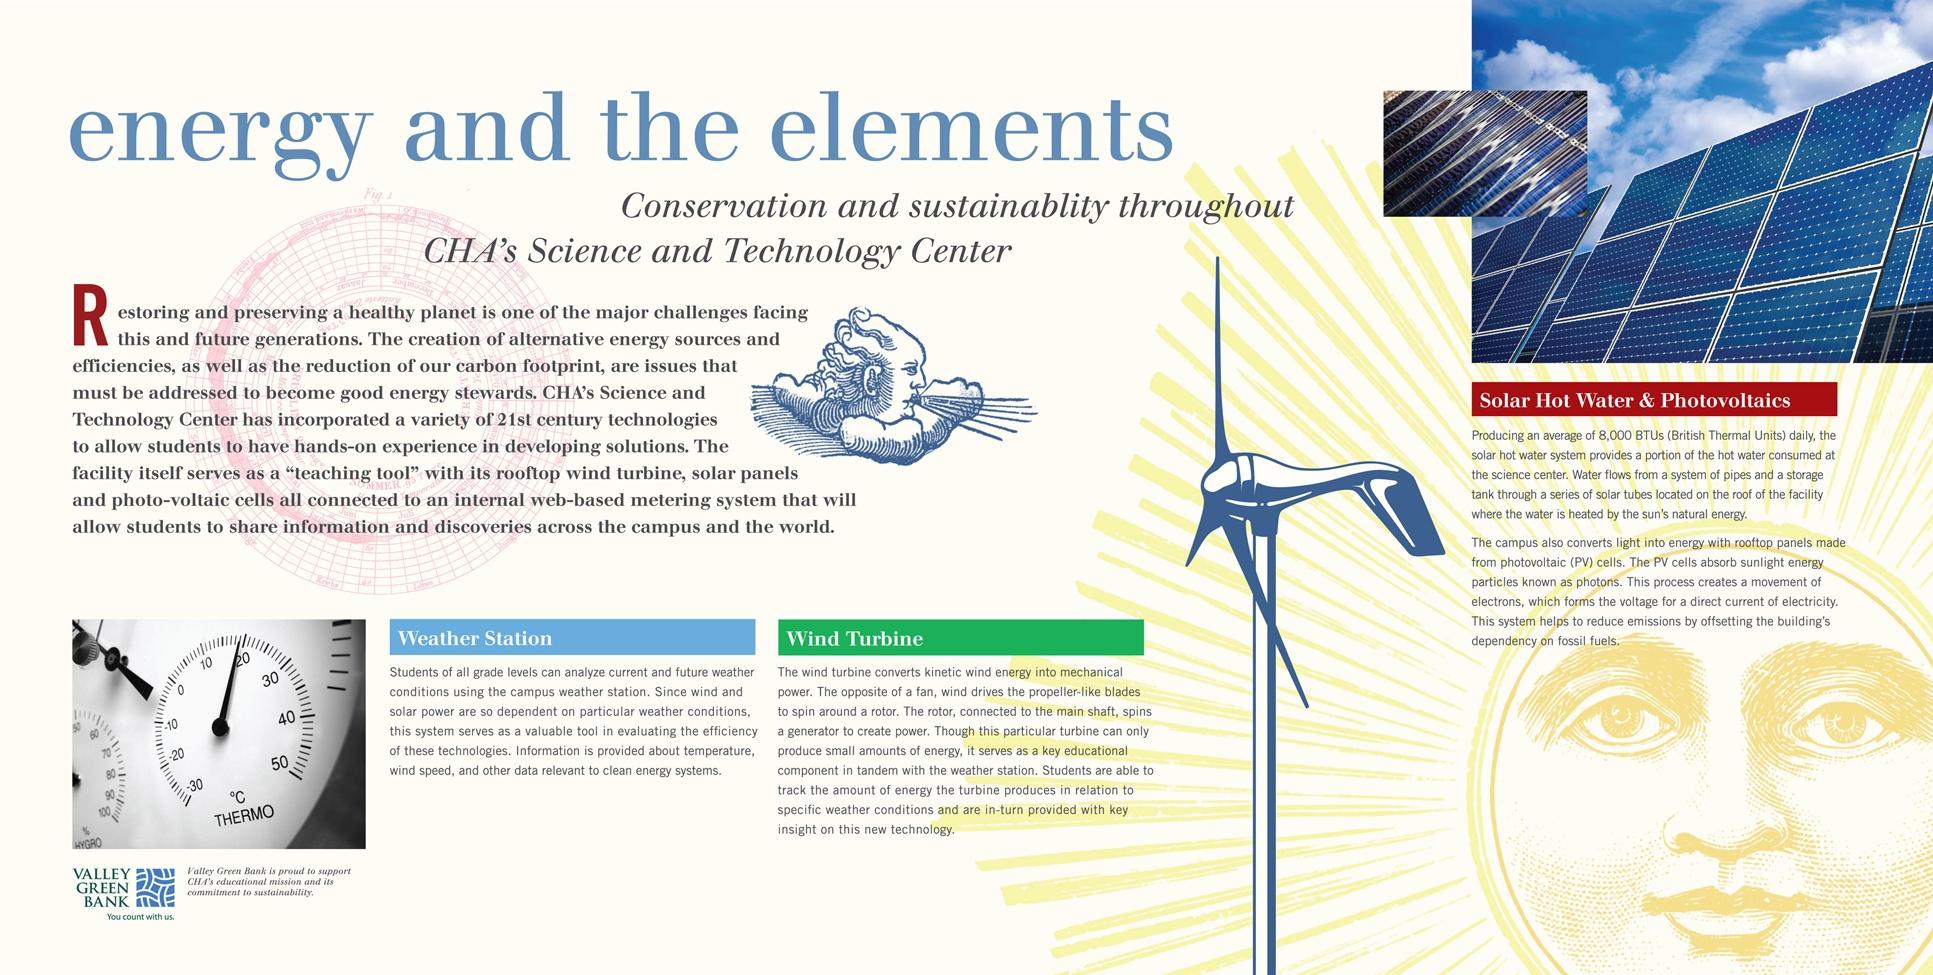 Energy-Panel-121708.jpg